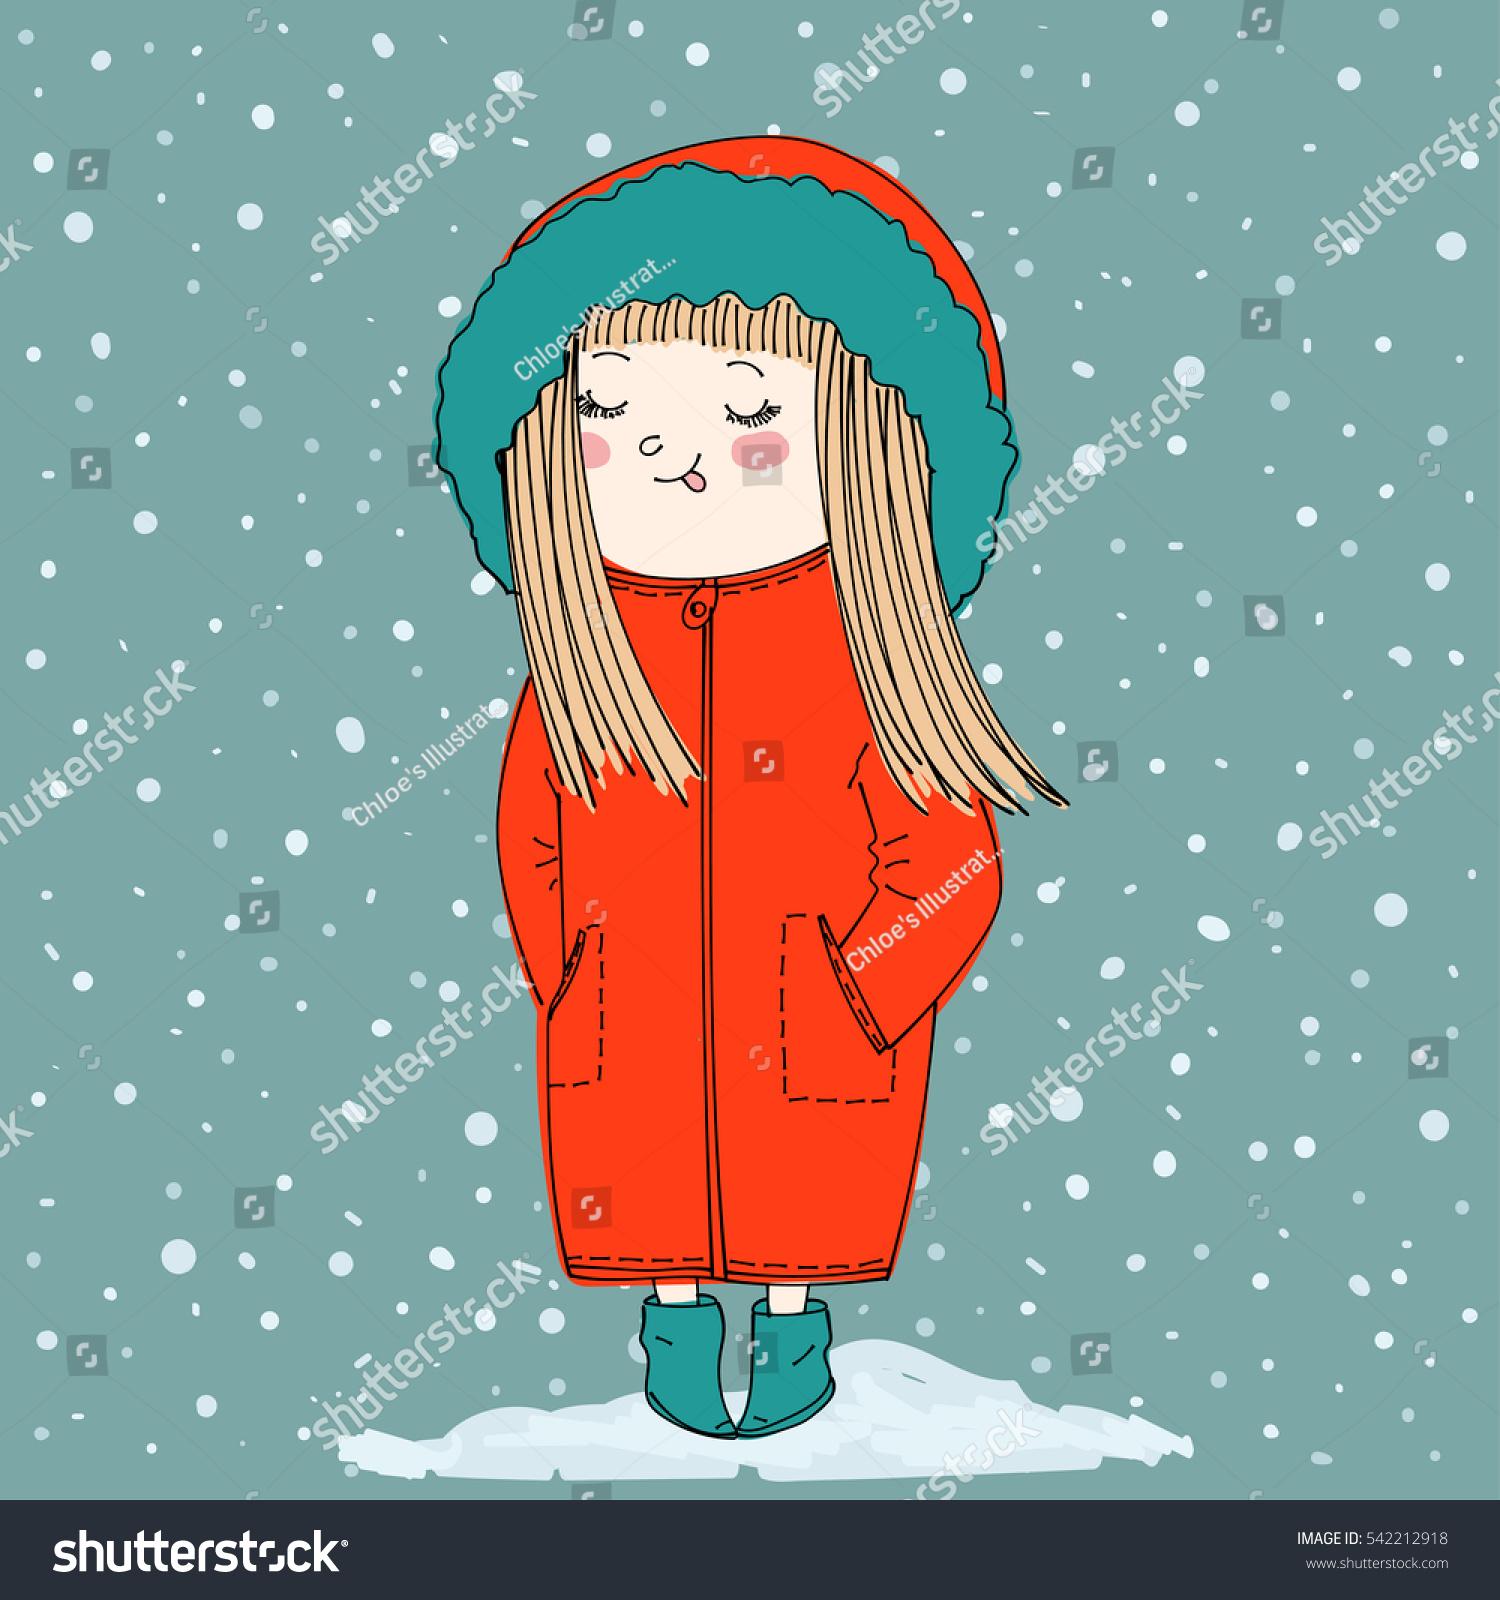 stock-vector-cute-girl-wearing-warm-wint